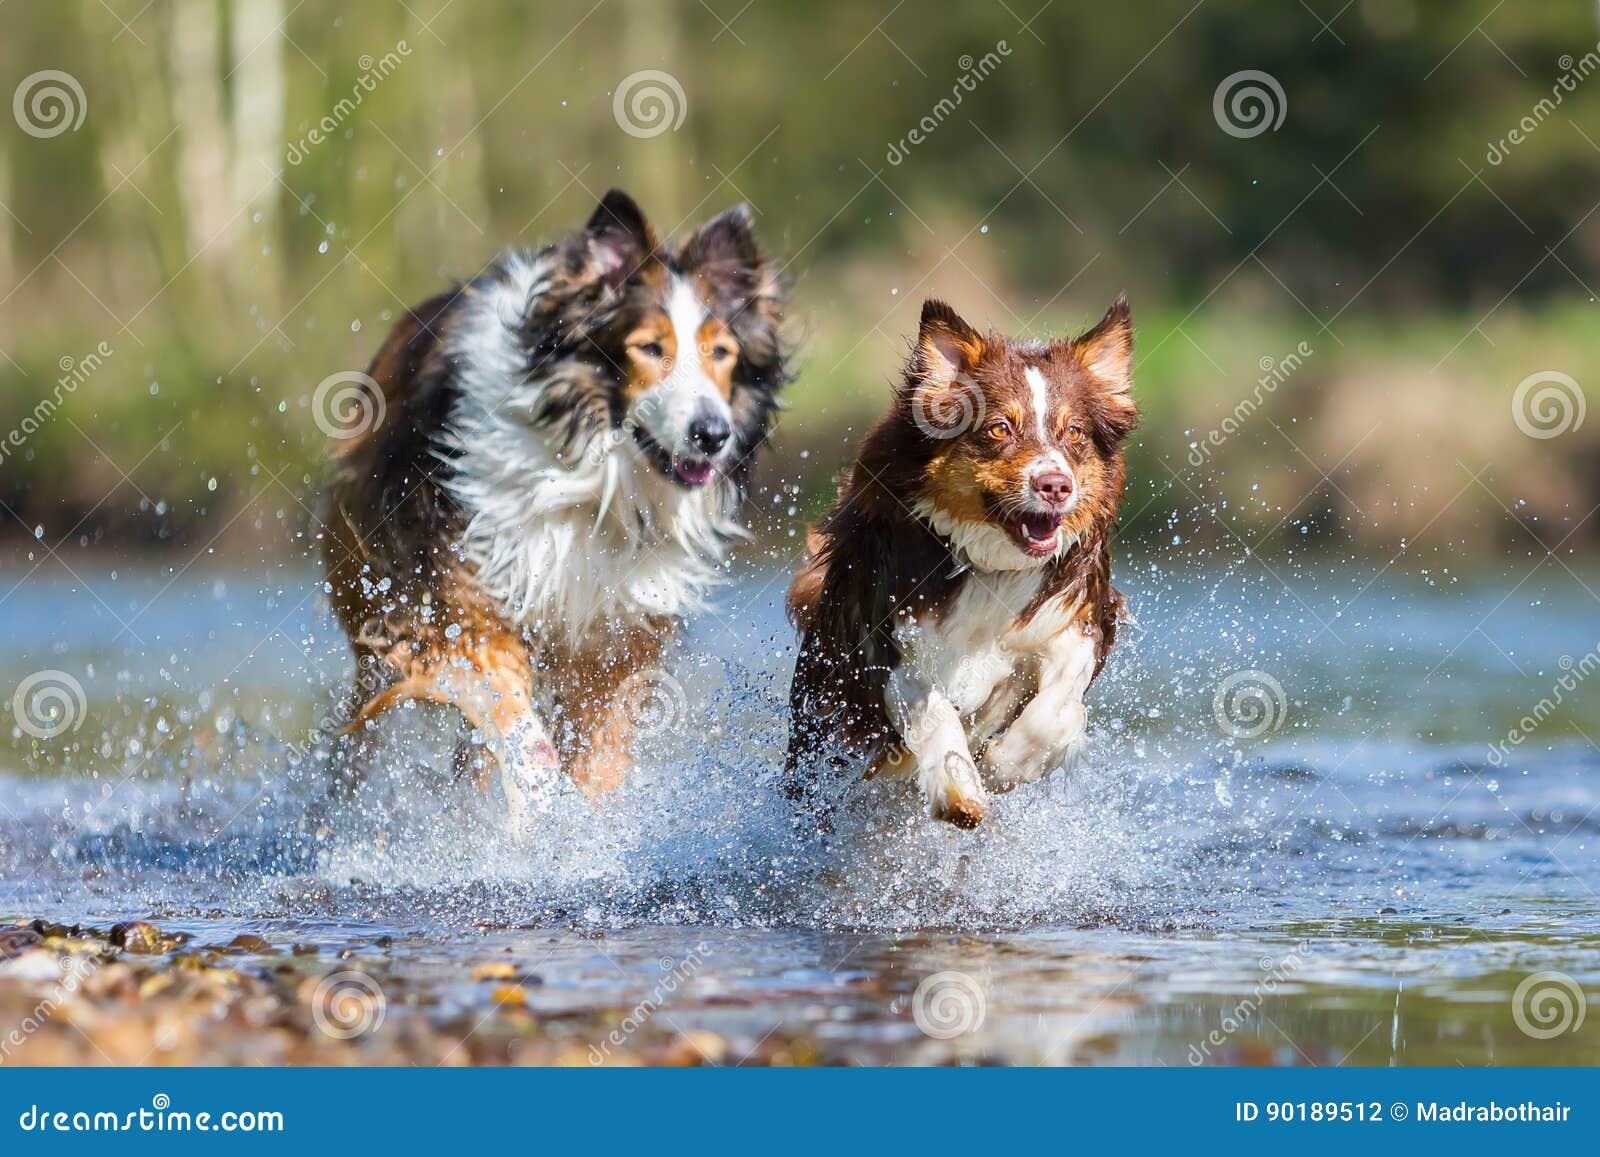 Collie-blandning hund och australisk herdespring i en flod